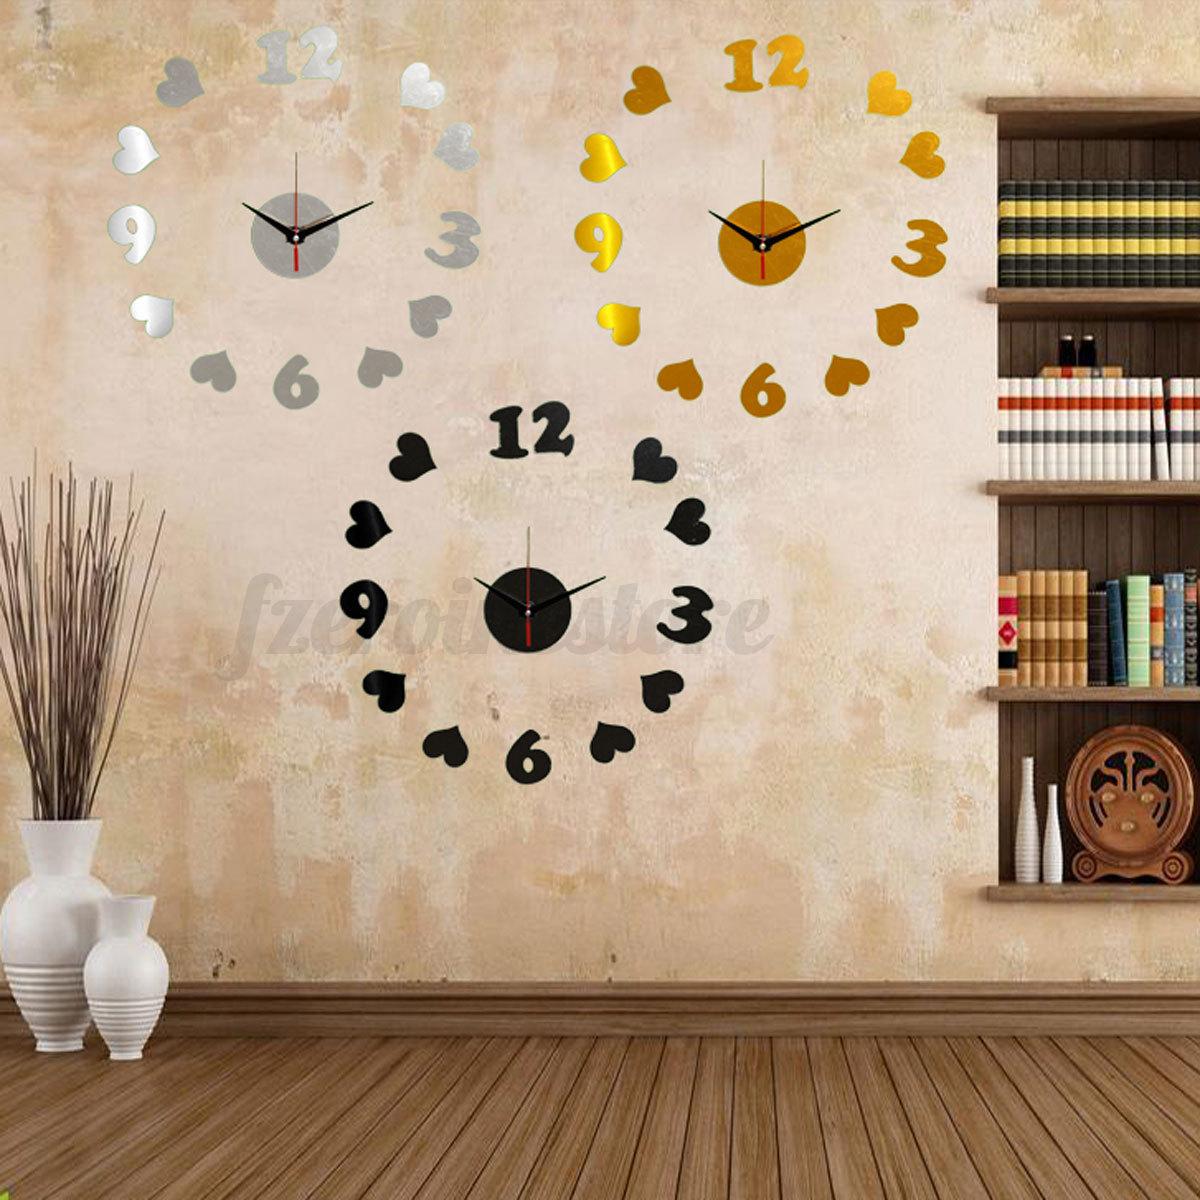 3d modern design wanduhr spiegel wandtattoo wohnzimmer wanddeko ...